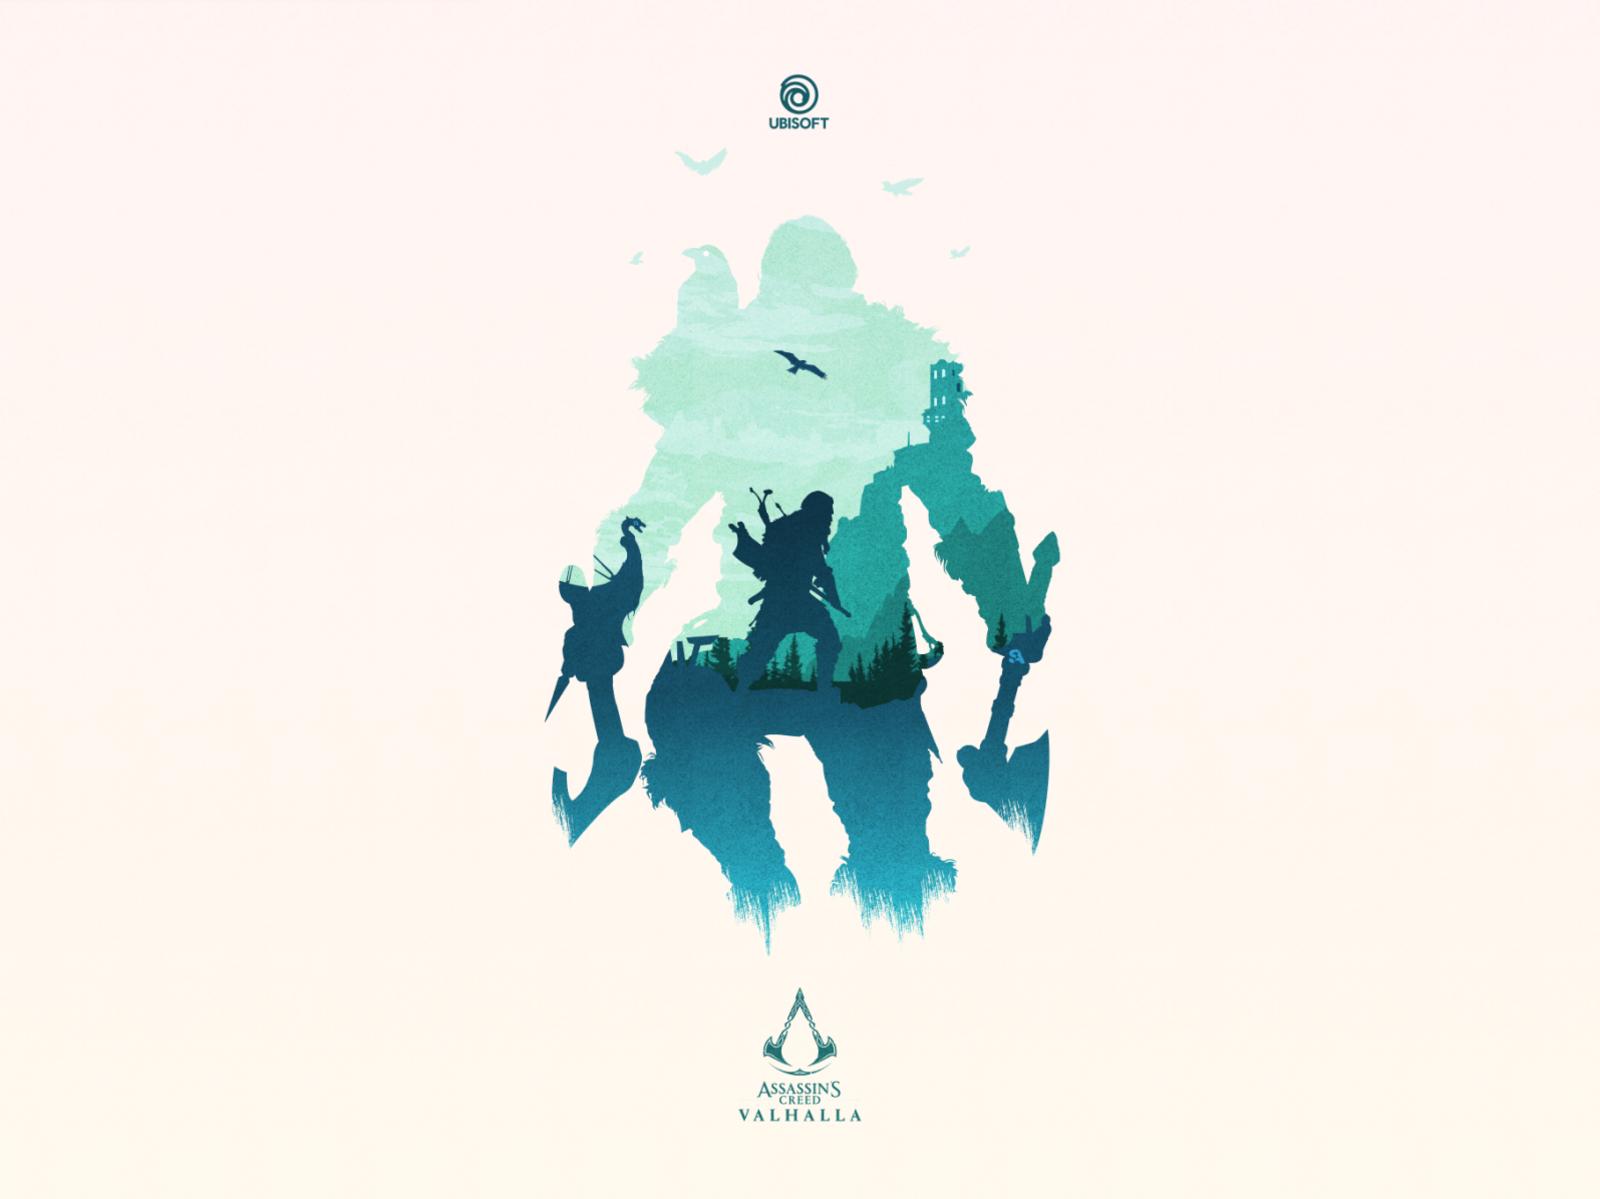 Assassins Creed Valhalla By Samraj Agarwal On Dribbble